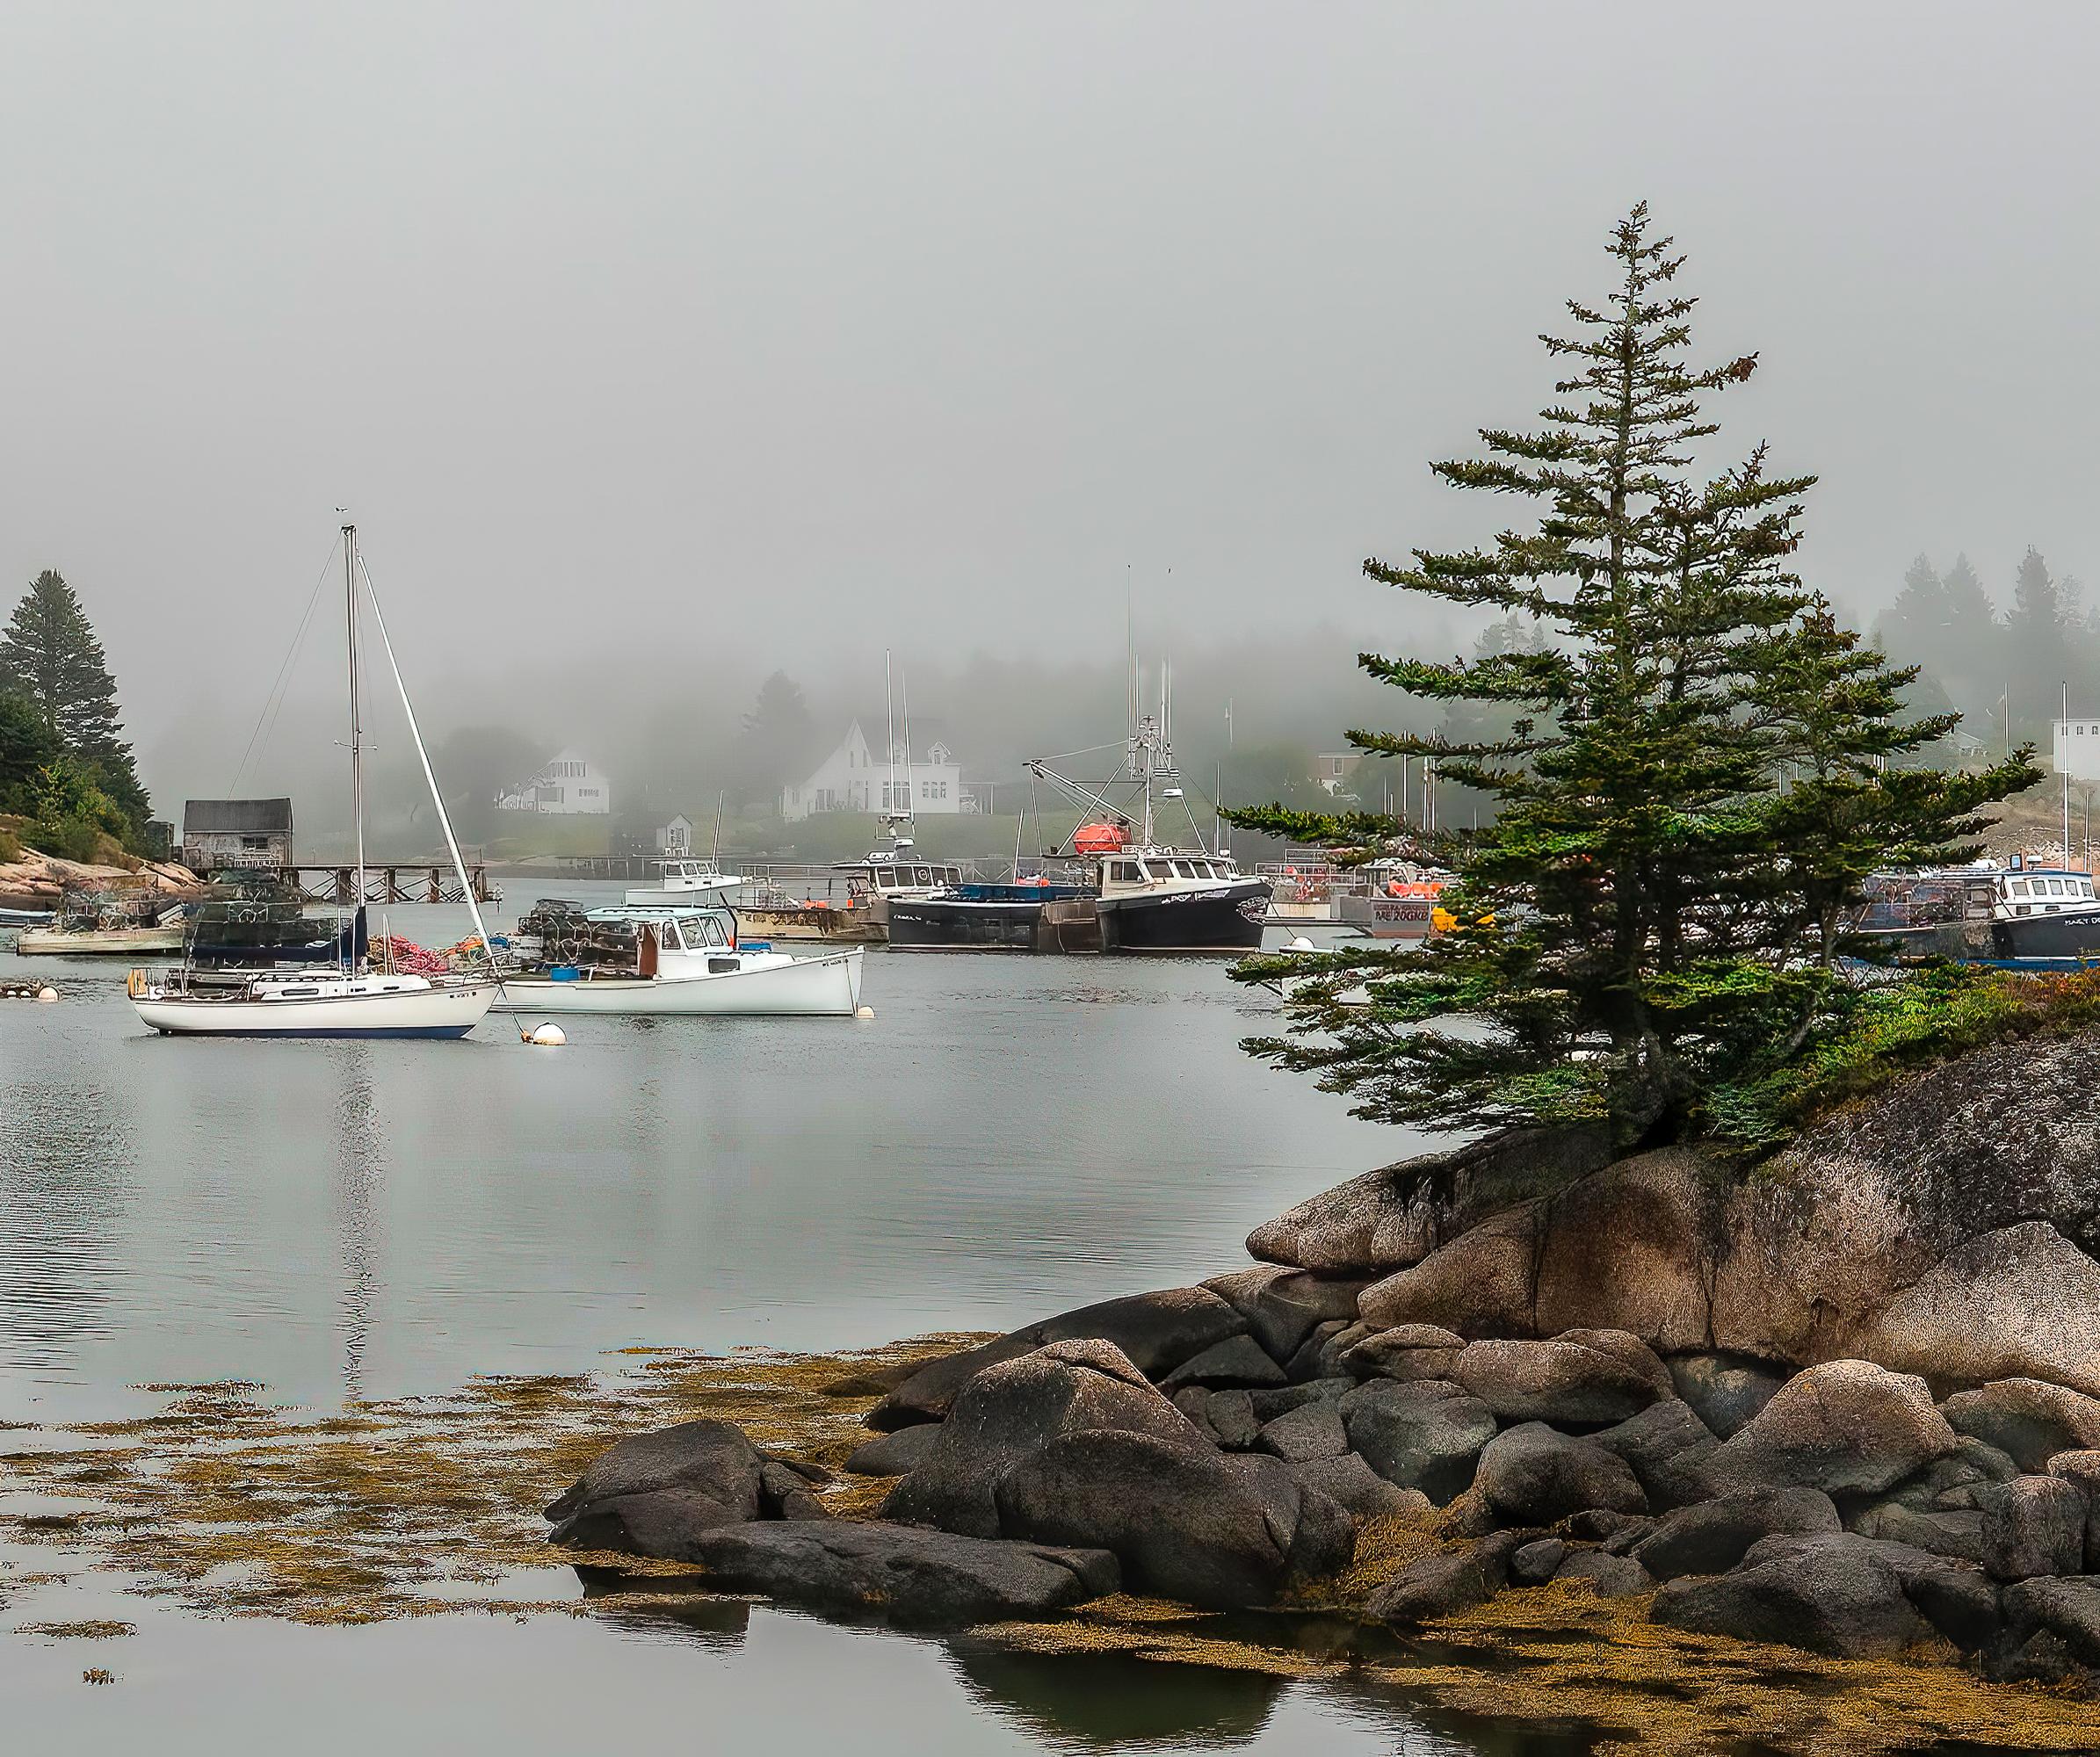 Sorrento-Harbor-on-a-Foggy-Day